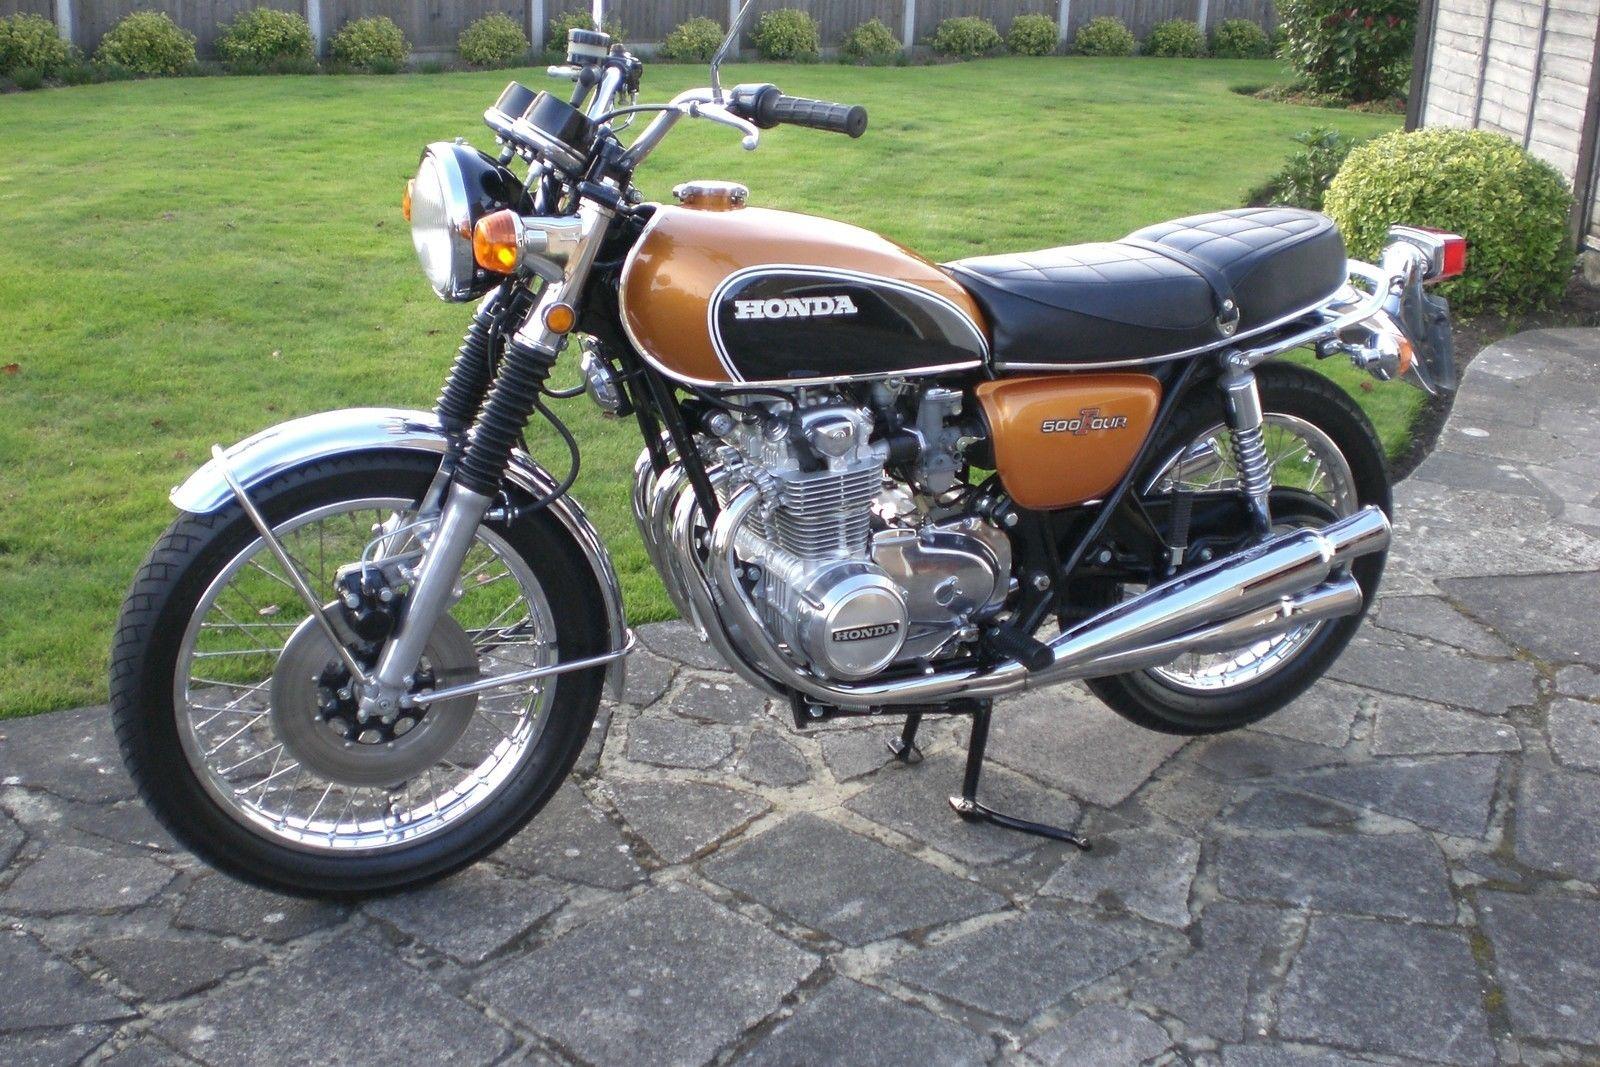 Px Yamaha Ct Orange moreover Ktm as well Simplex in addition Bfc Bda C C B B Fb Eccbbaa   Srz also Yamaha Enduro. on 1971 yamaha 175 enduro